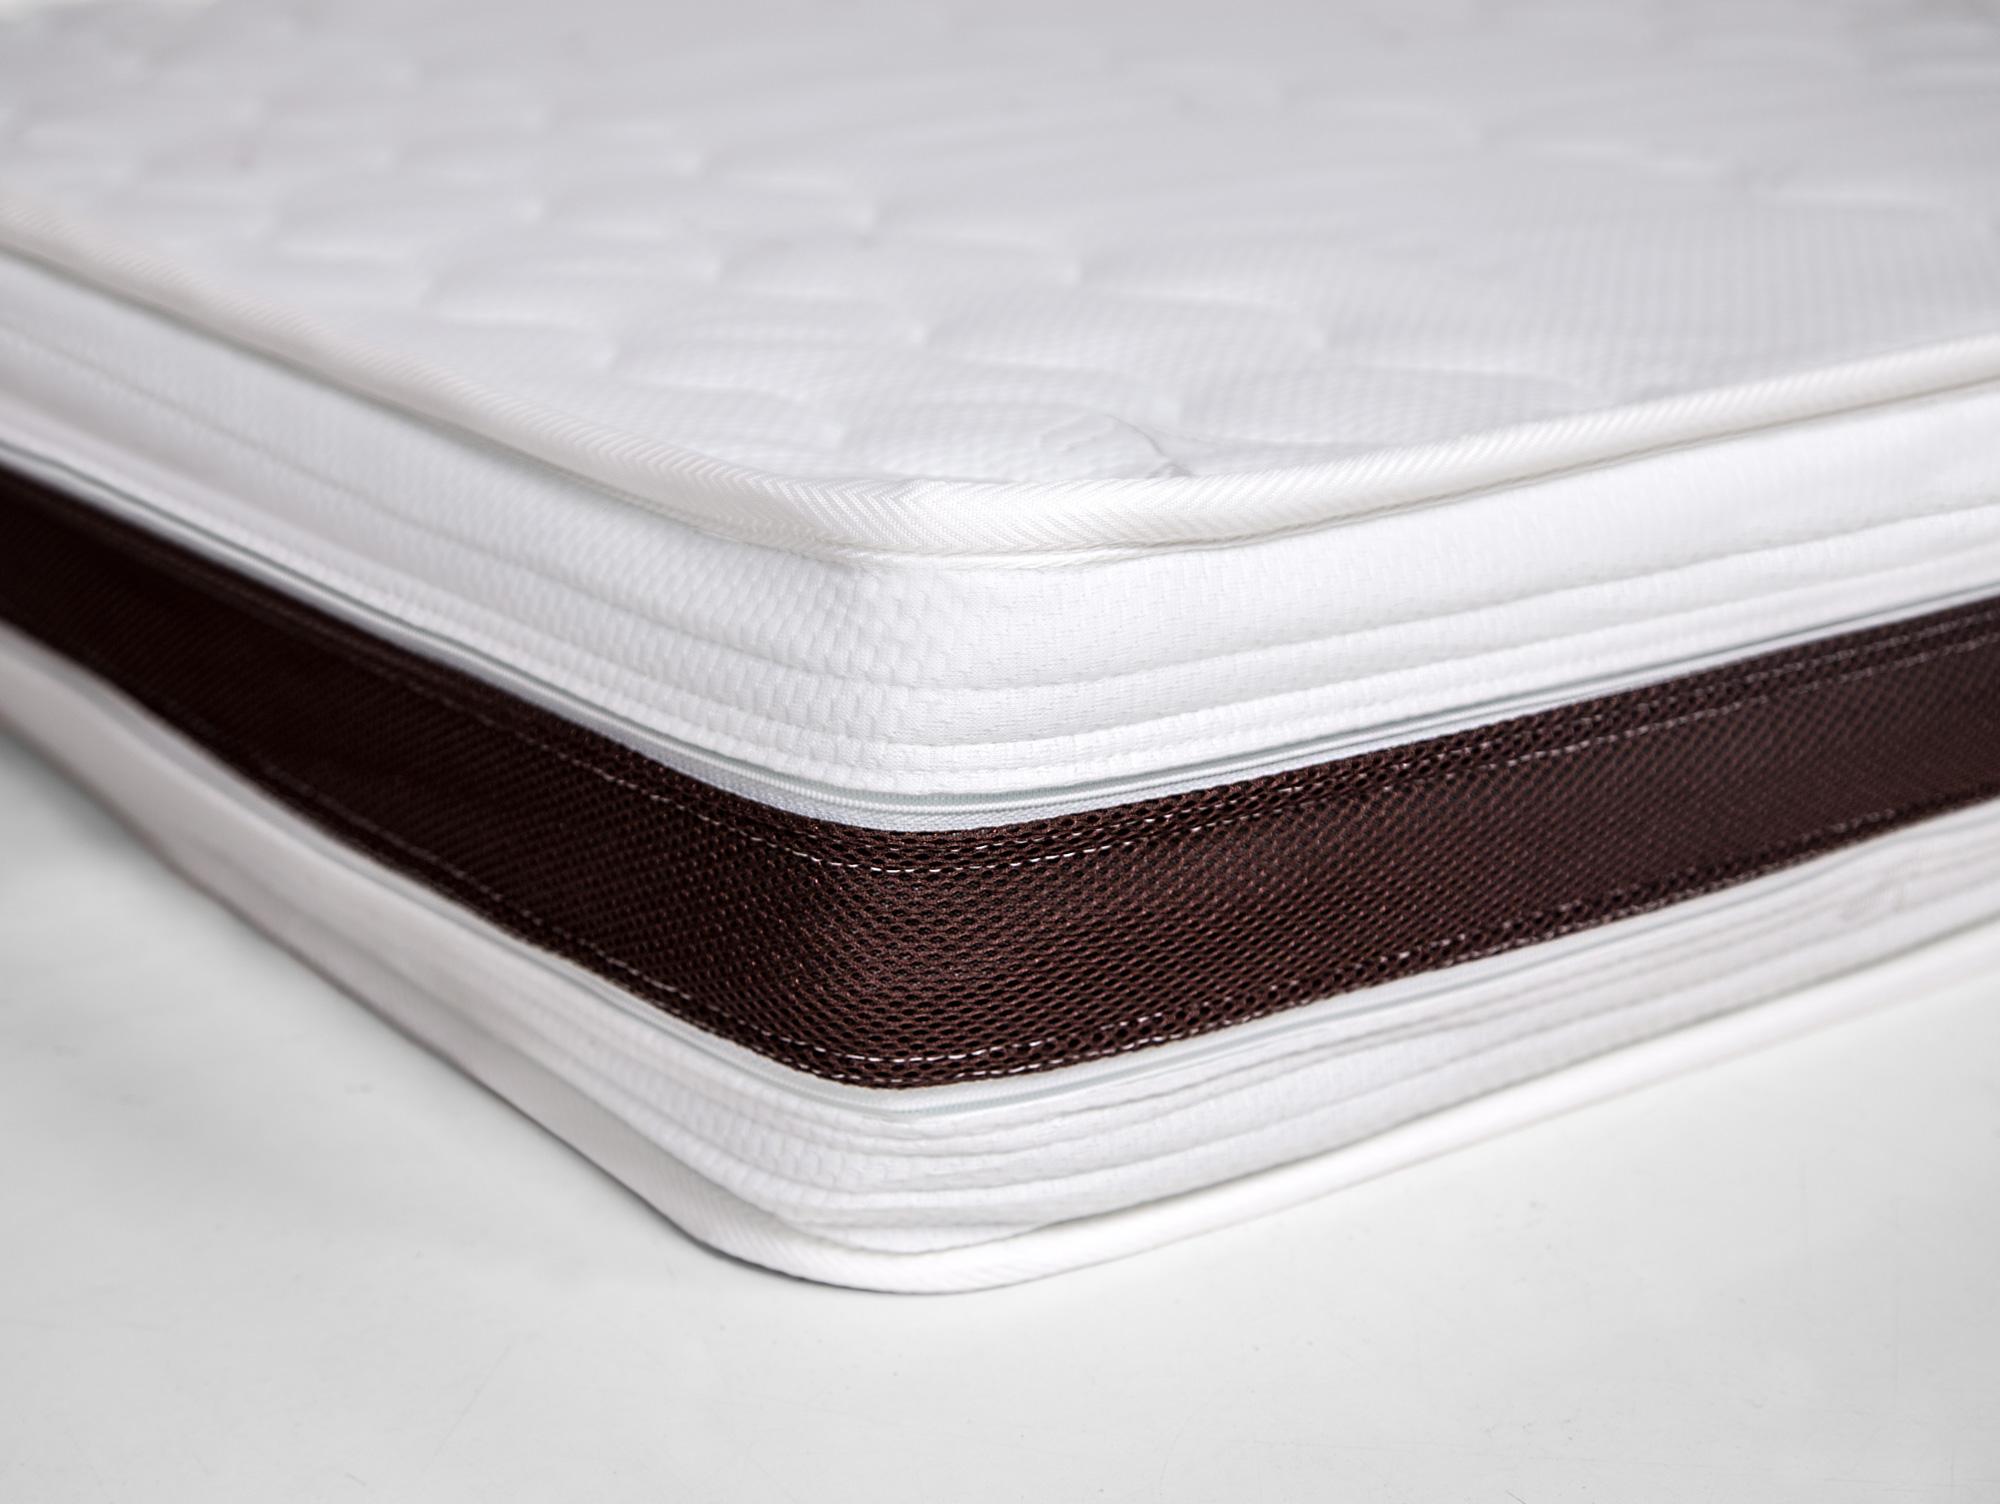 deluxe foam kaltschaummatratze 100 x 200 cm h rtegrad 3. Black Bedroom Furniture Sets. Home Design Ideas